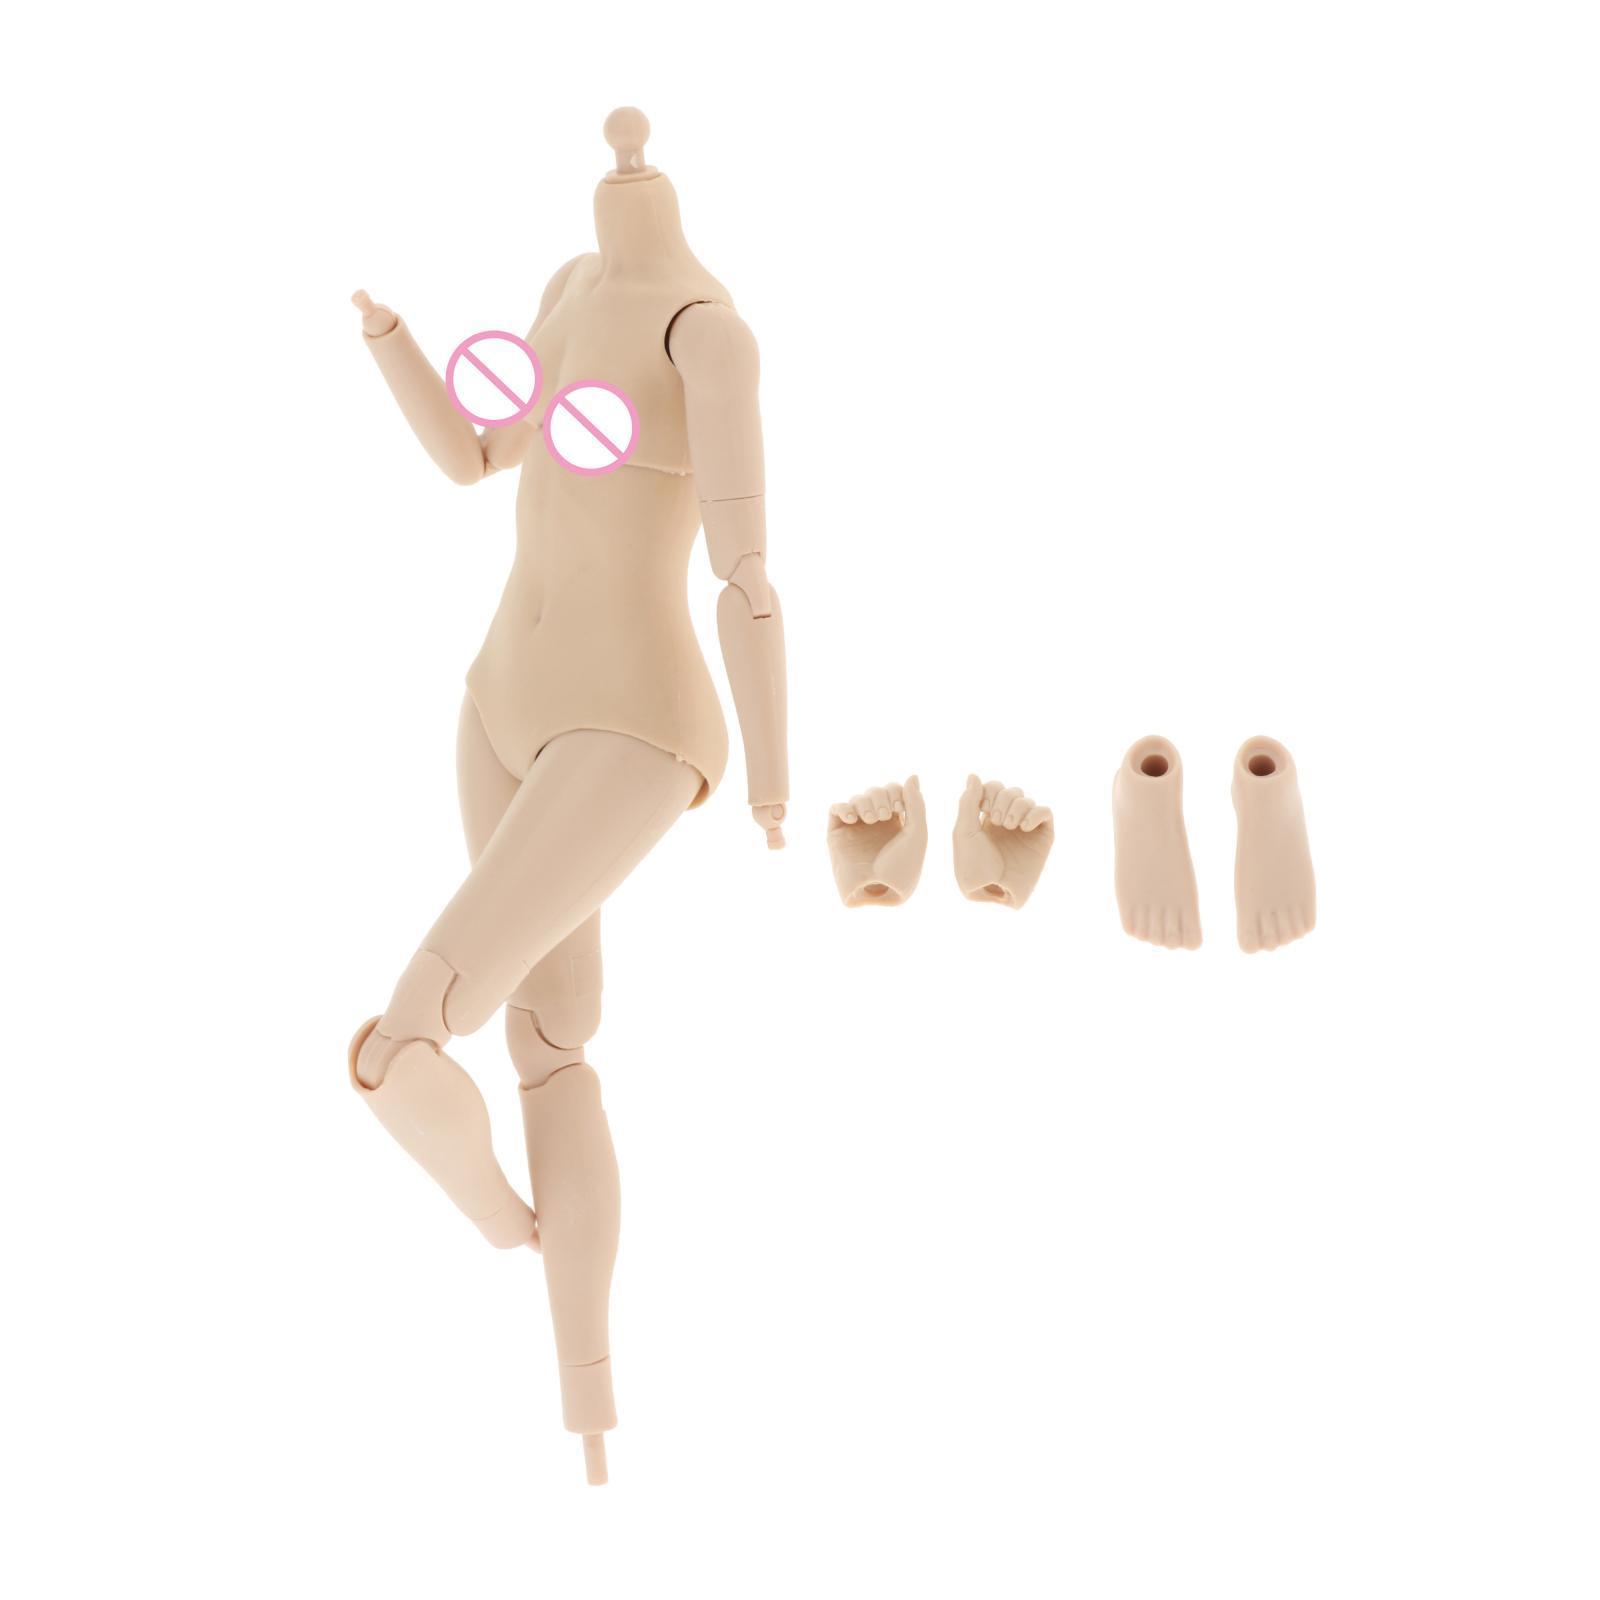 miniature 16 - 1/6 Scale Female Flexible Body 12 Inches Action Figure Body Seamless Figure